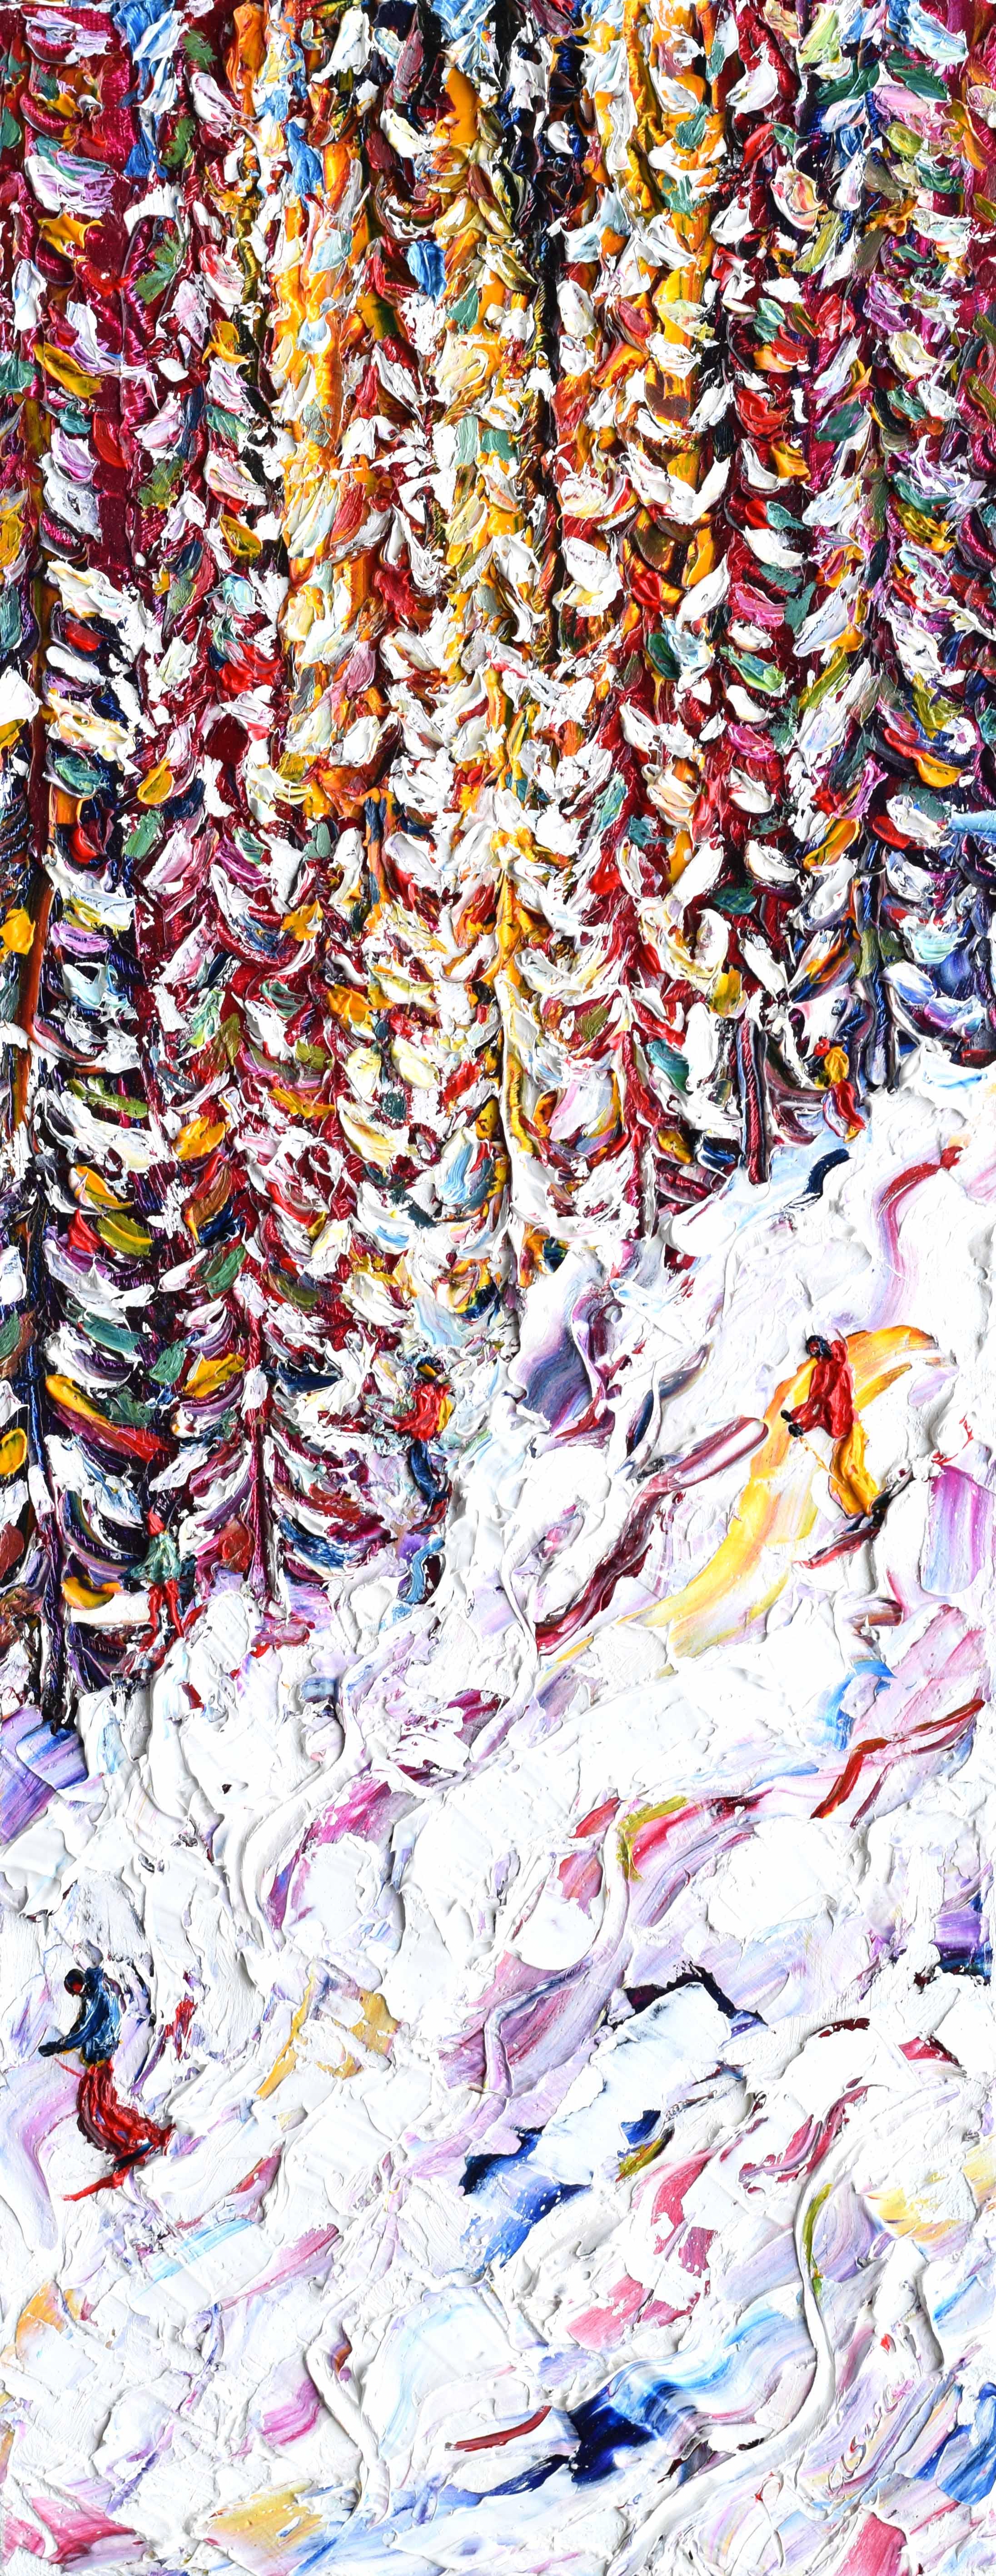 Celerina Ski Painting St Moritz